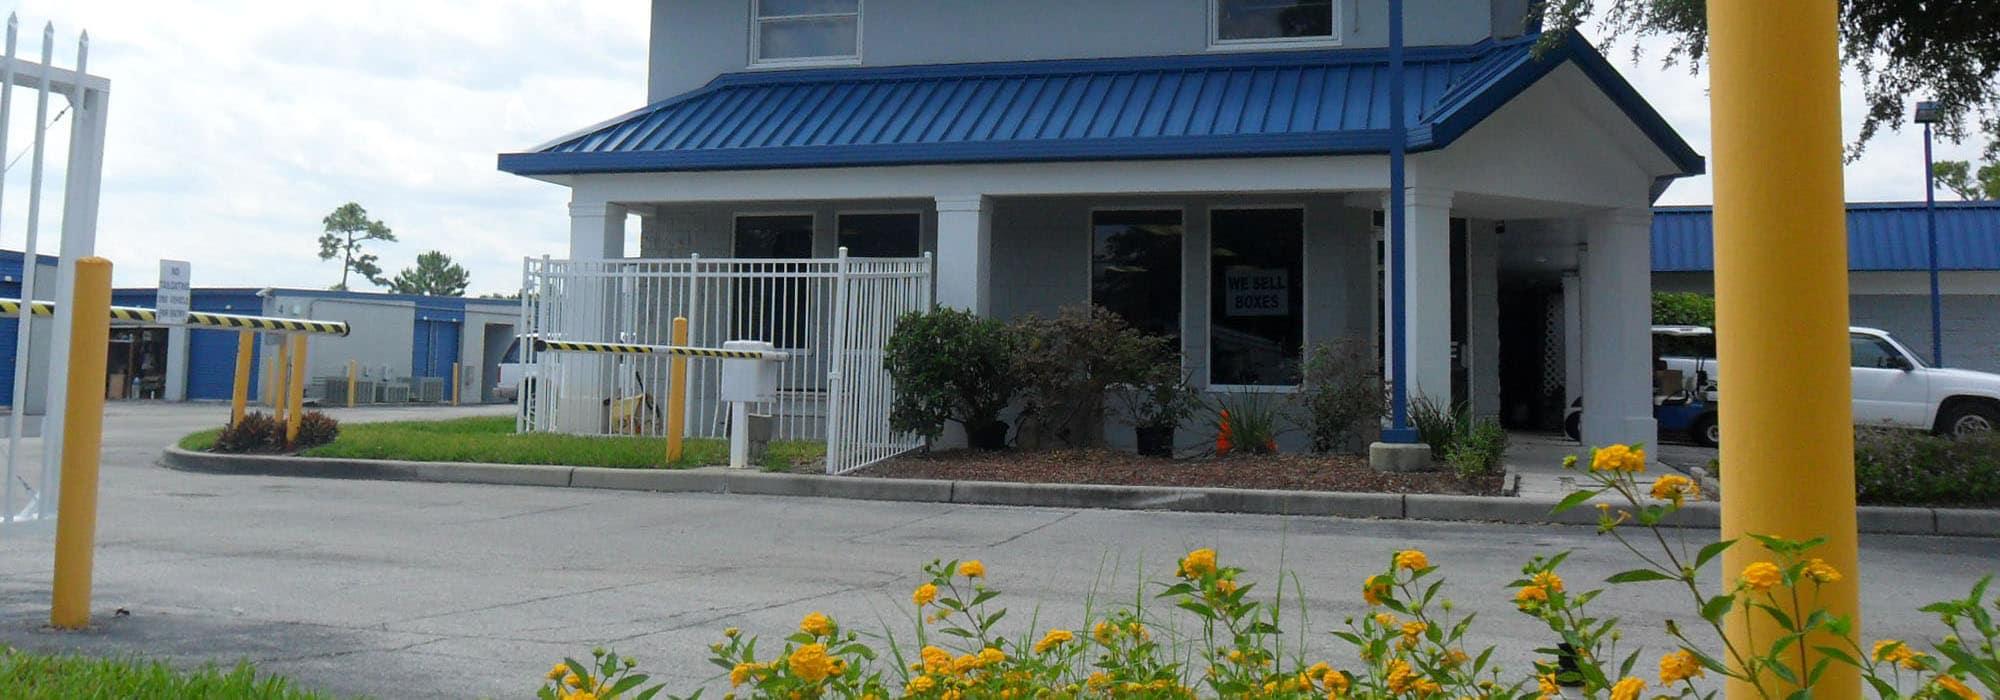 Self Storage Units Winter Park, FL | United Stor-All Self Storage